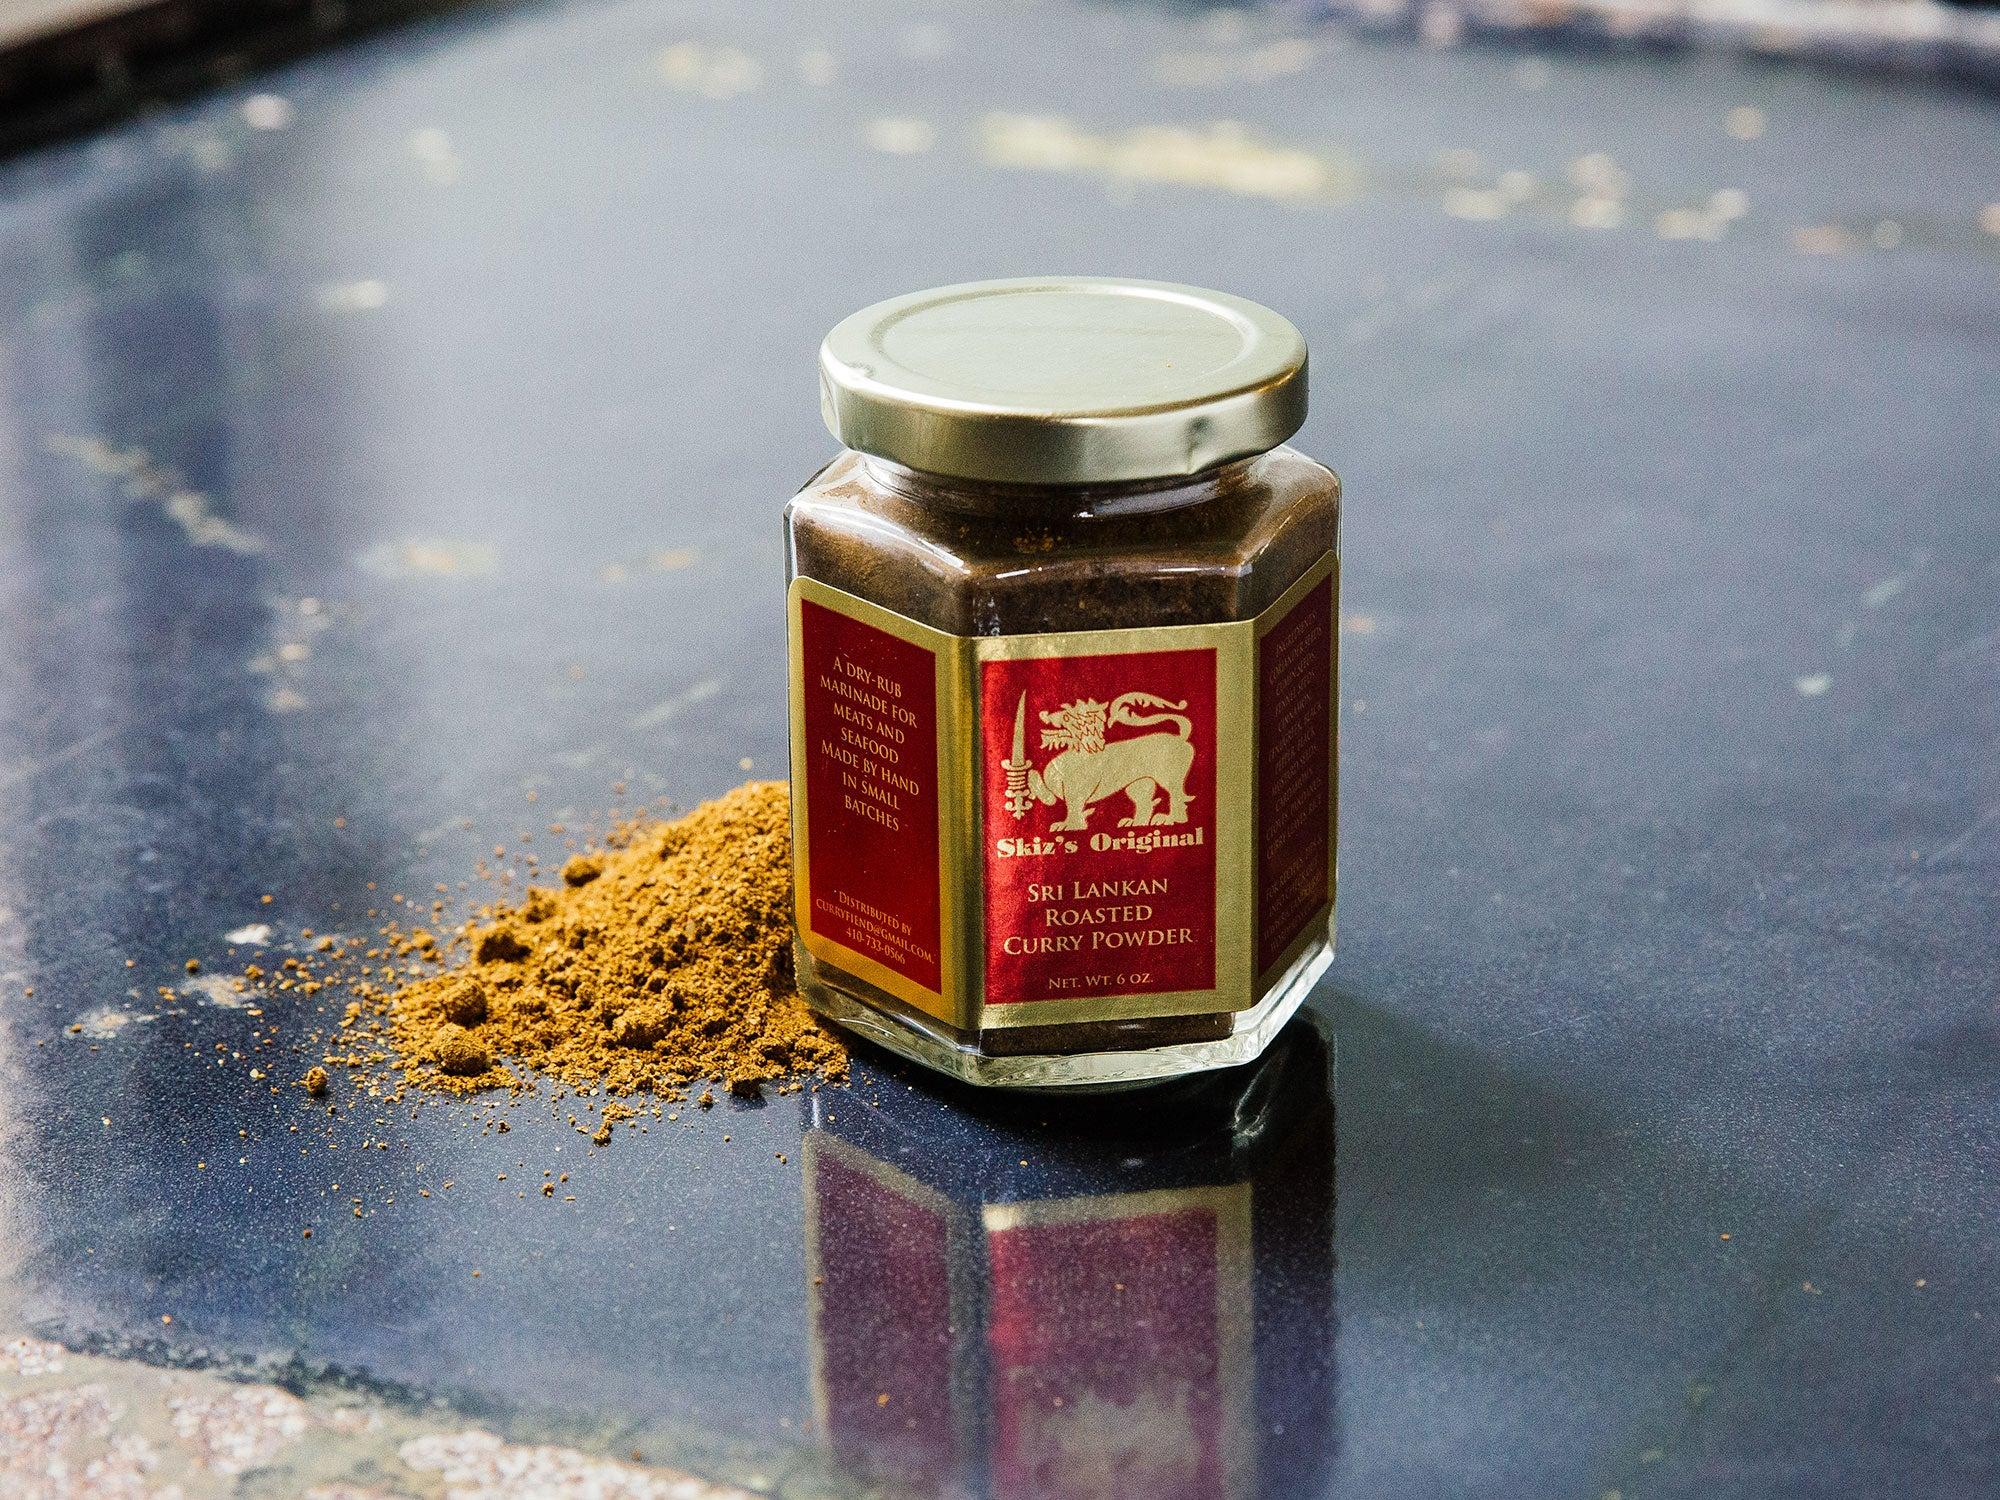 The Sri Lankan Secret to Crazy-Good Curry Powder